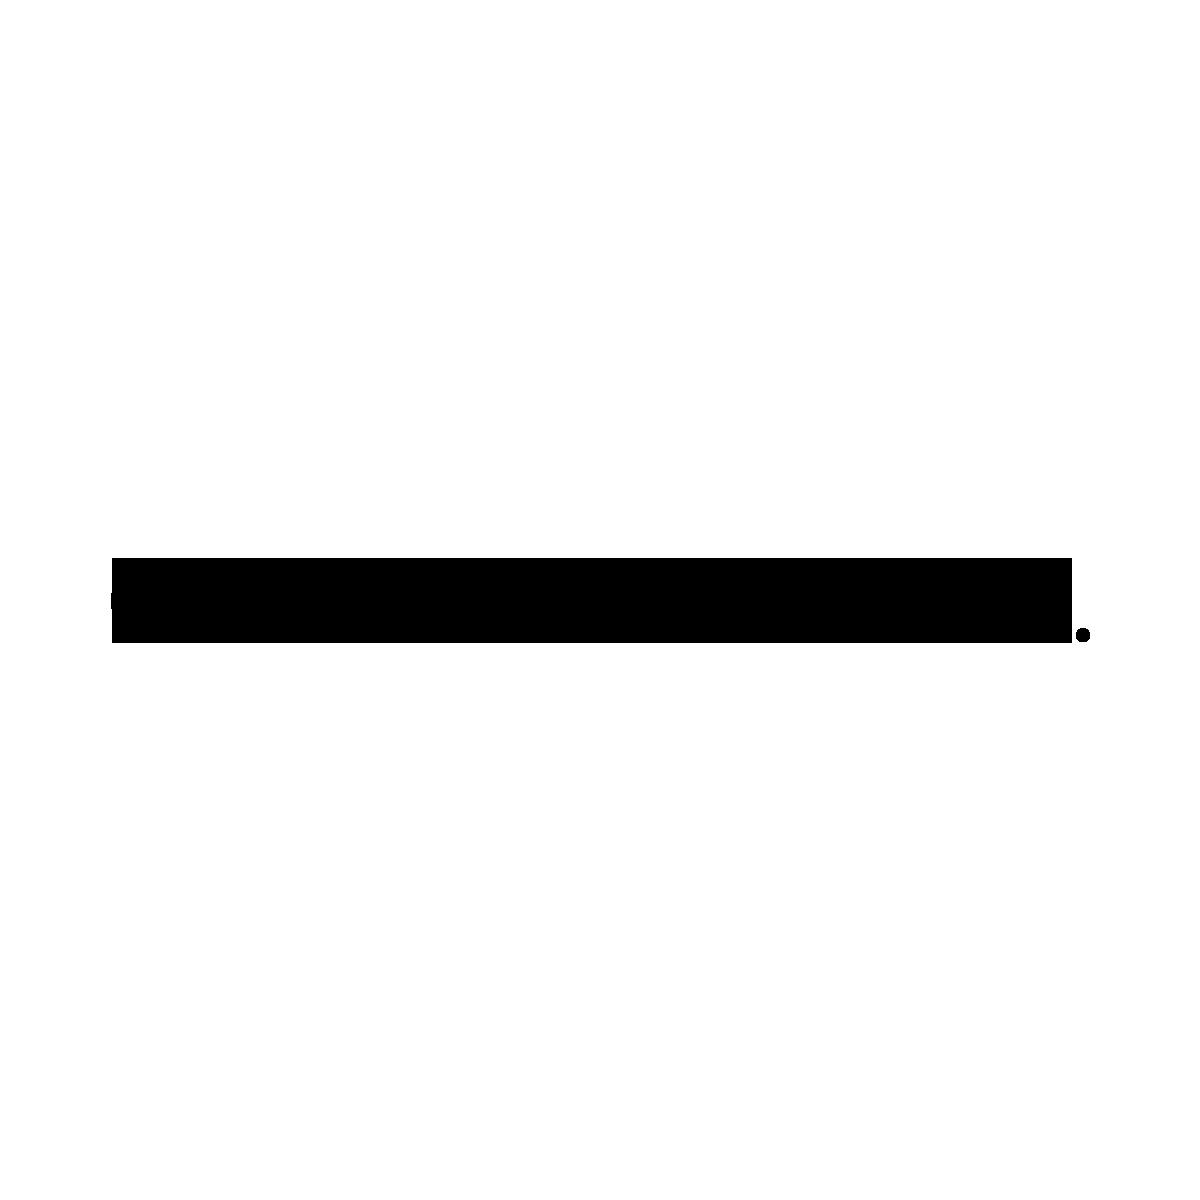 fred de la bretoniere ballerina printed leather taupe 140010002 packshot